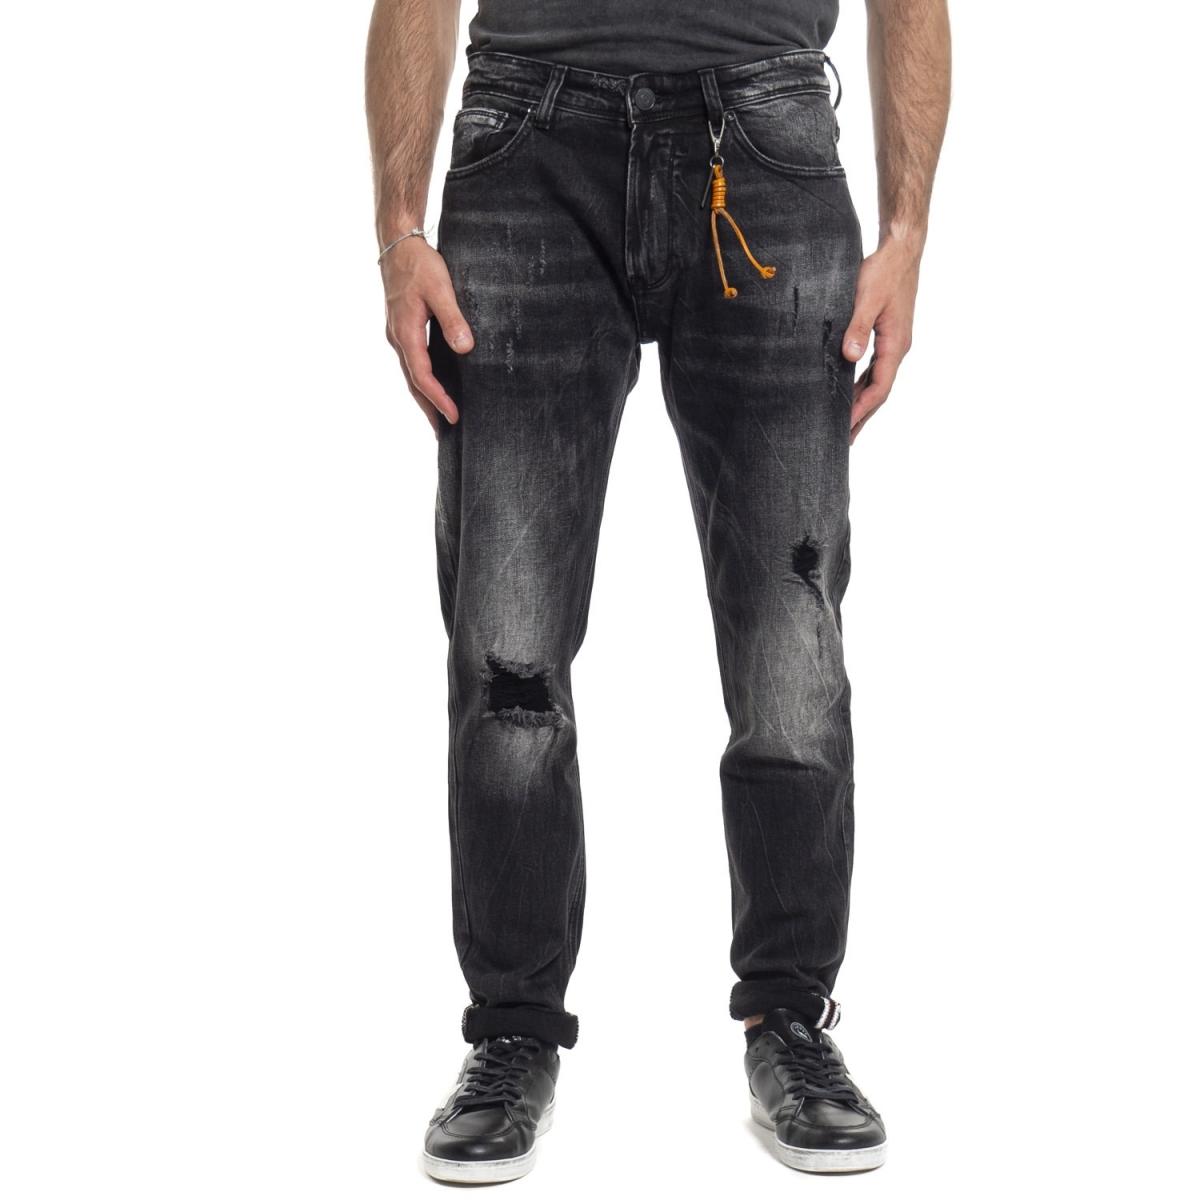 abbigliamento Jeans uomo Jeans regular fit GL2005T GIANNI LUPO Cafedelmar Shop